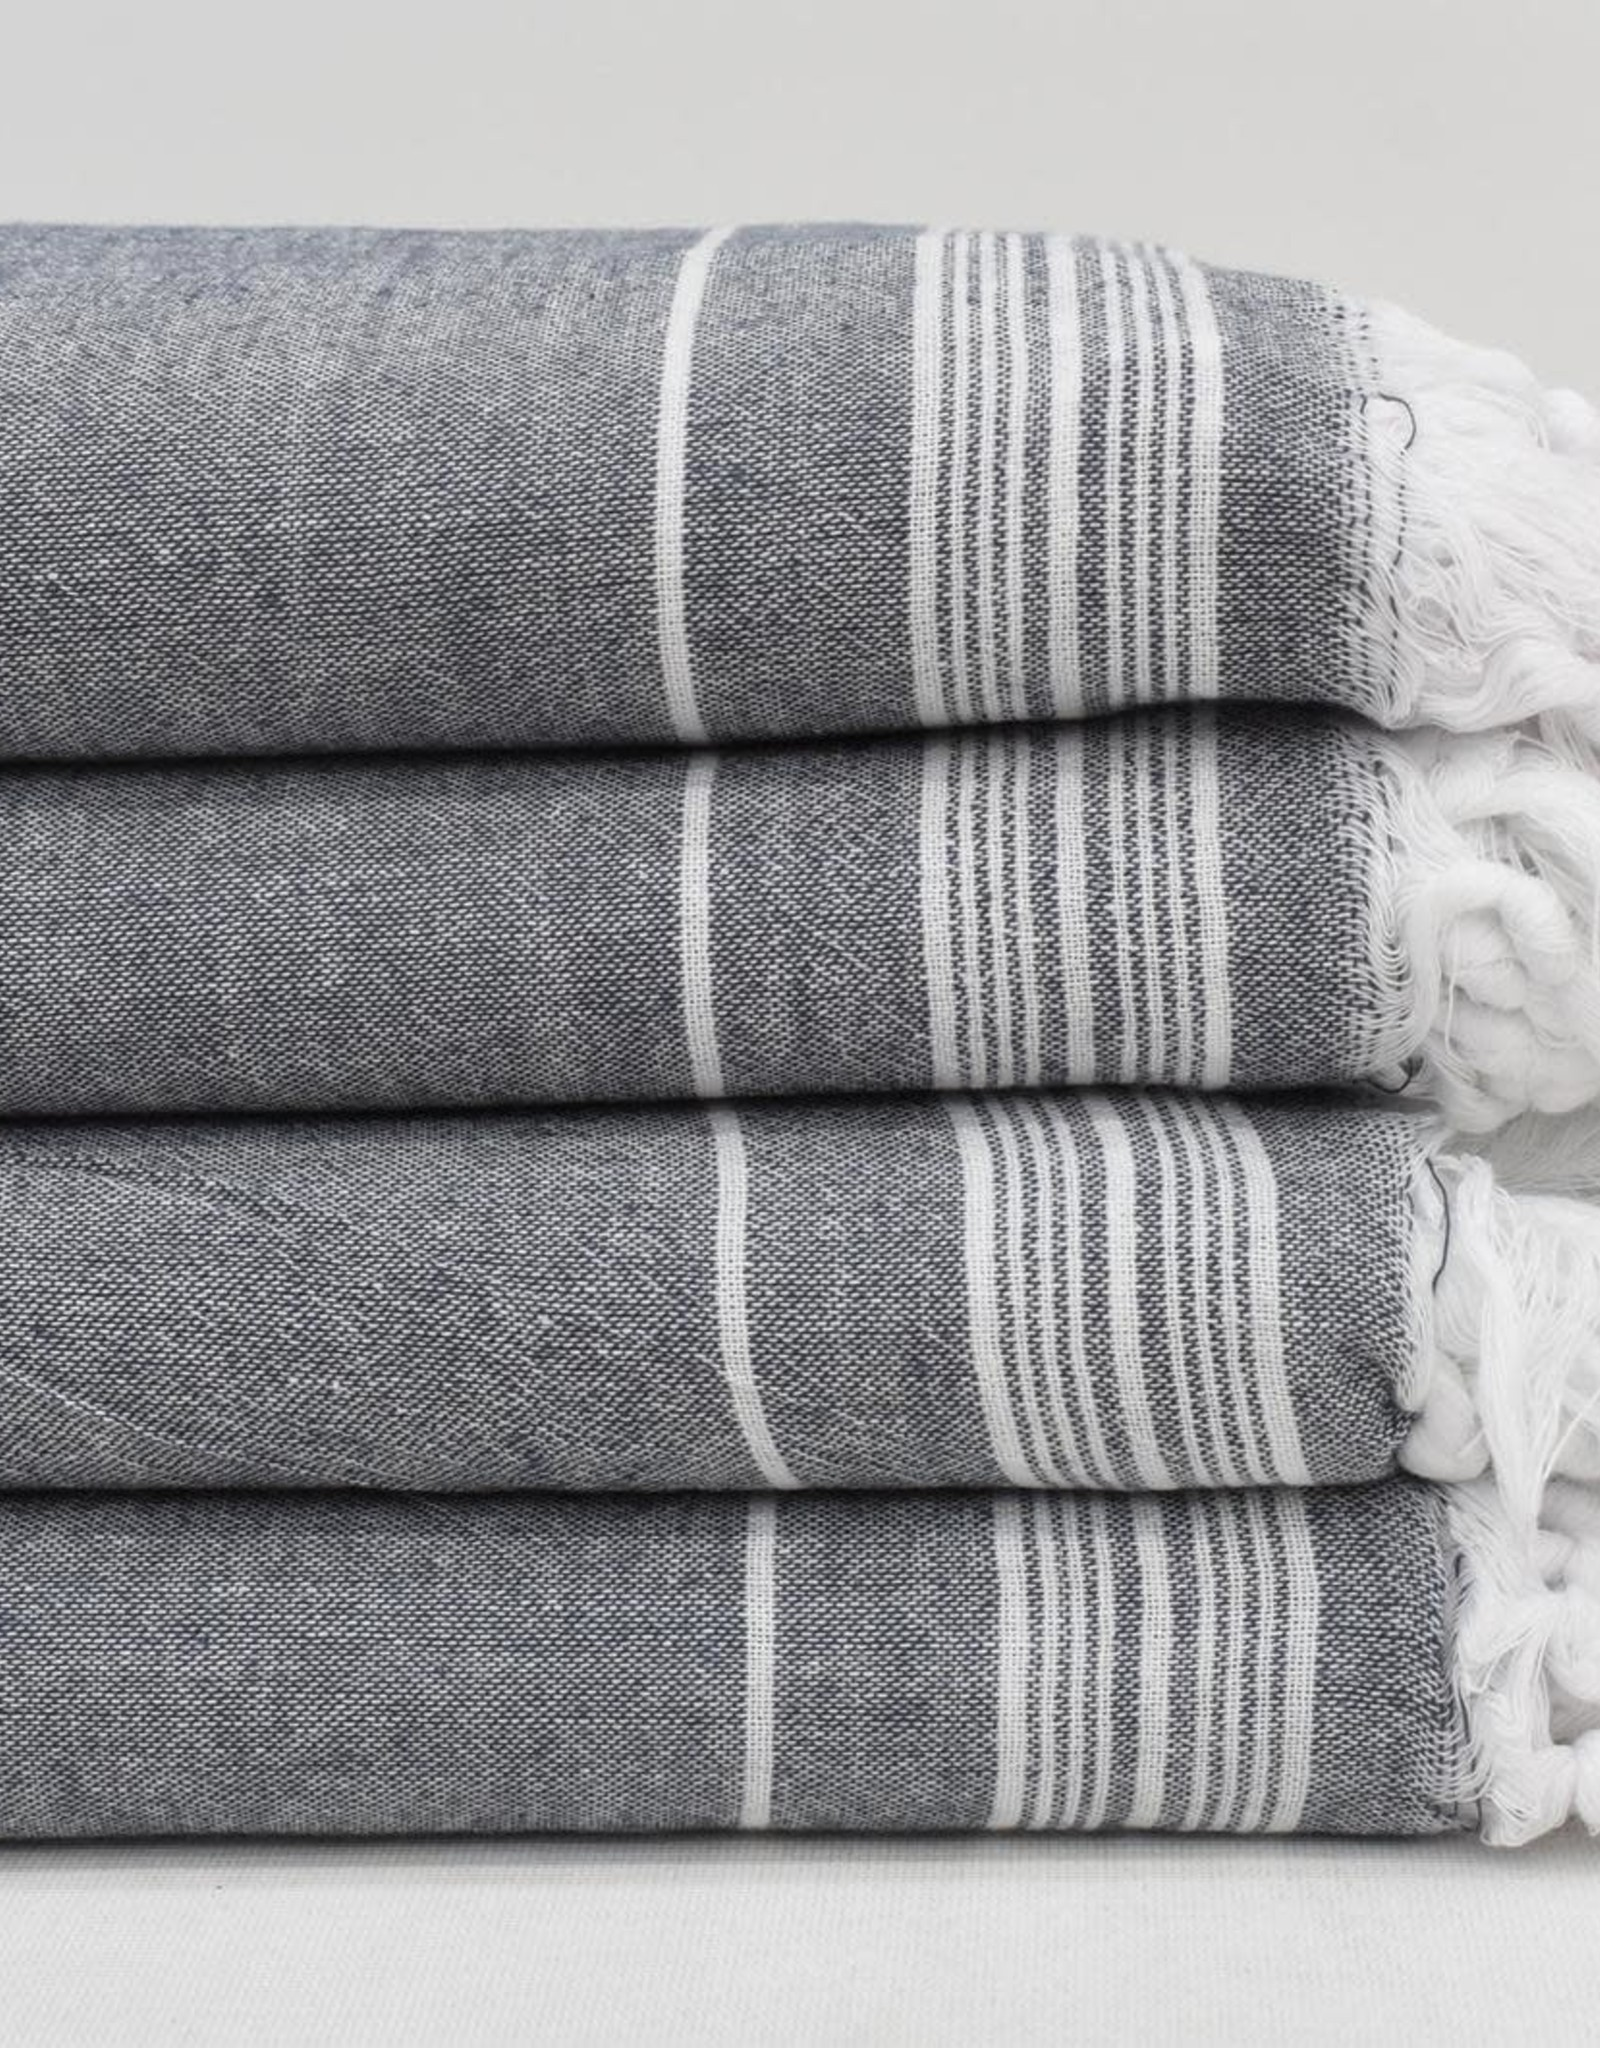 Turkish Towel Design Turkish Lightweight Throw Picnic Blanket